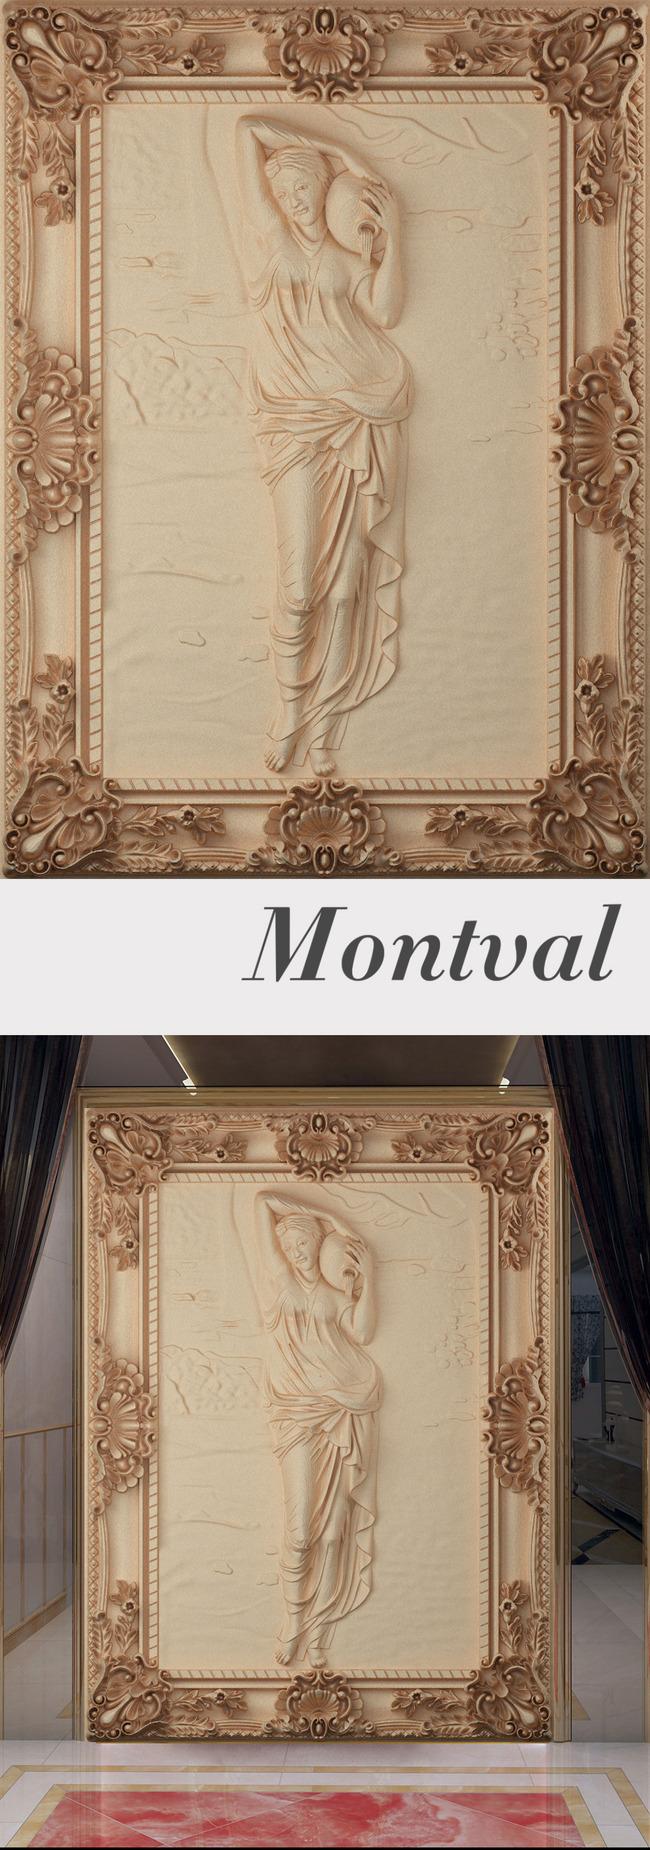 【tif不分层】欧式浮雕玄关壁画背景墙